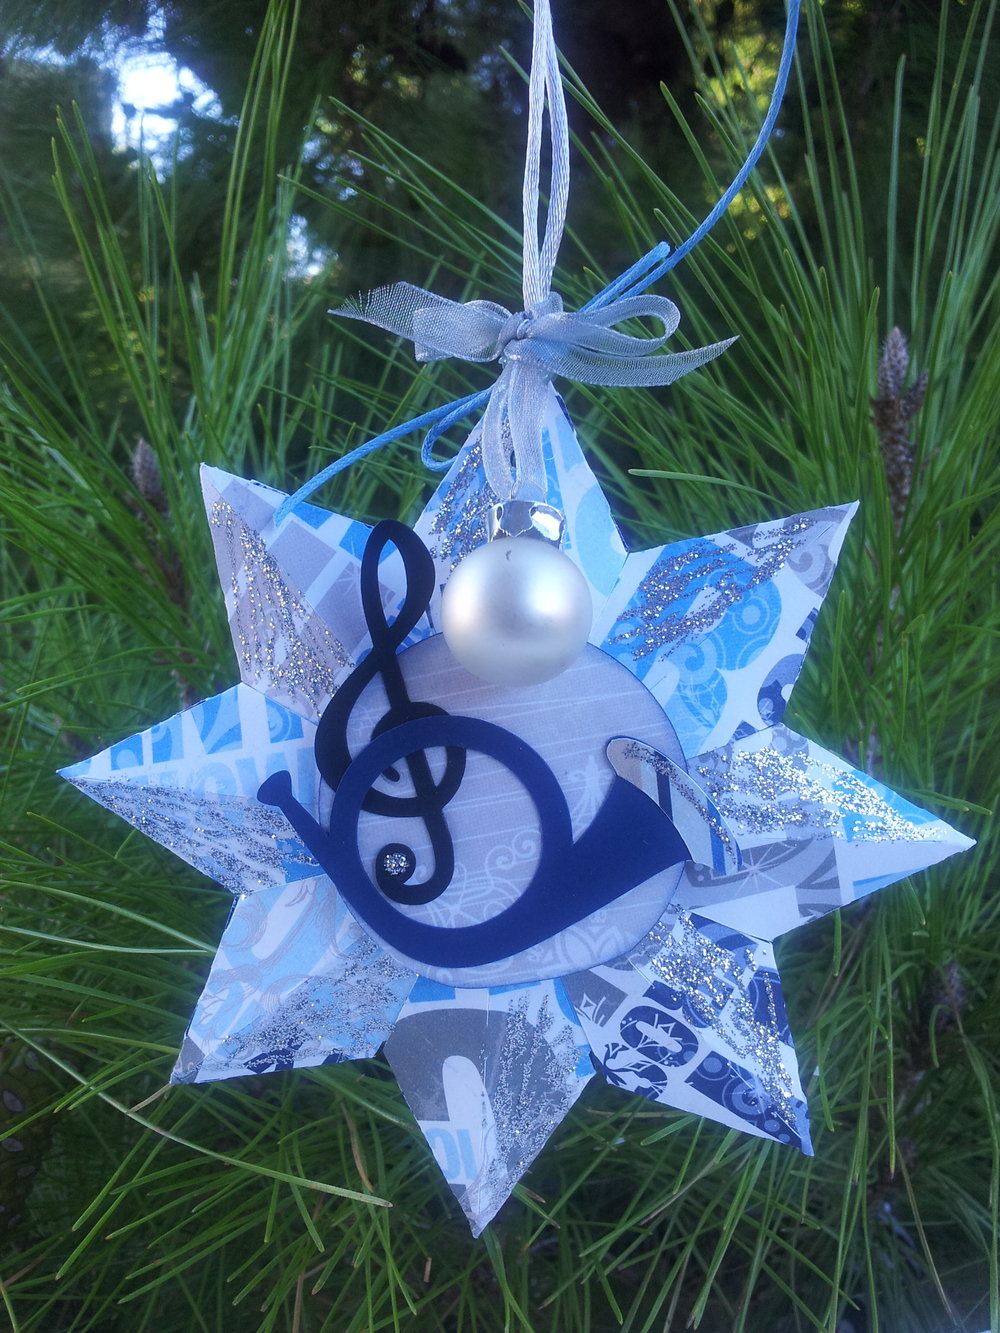 6. Star Ornament (music themed)